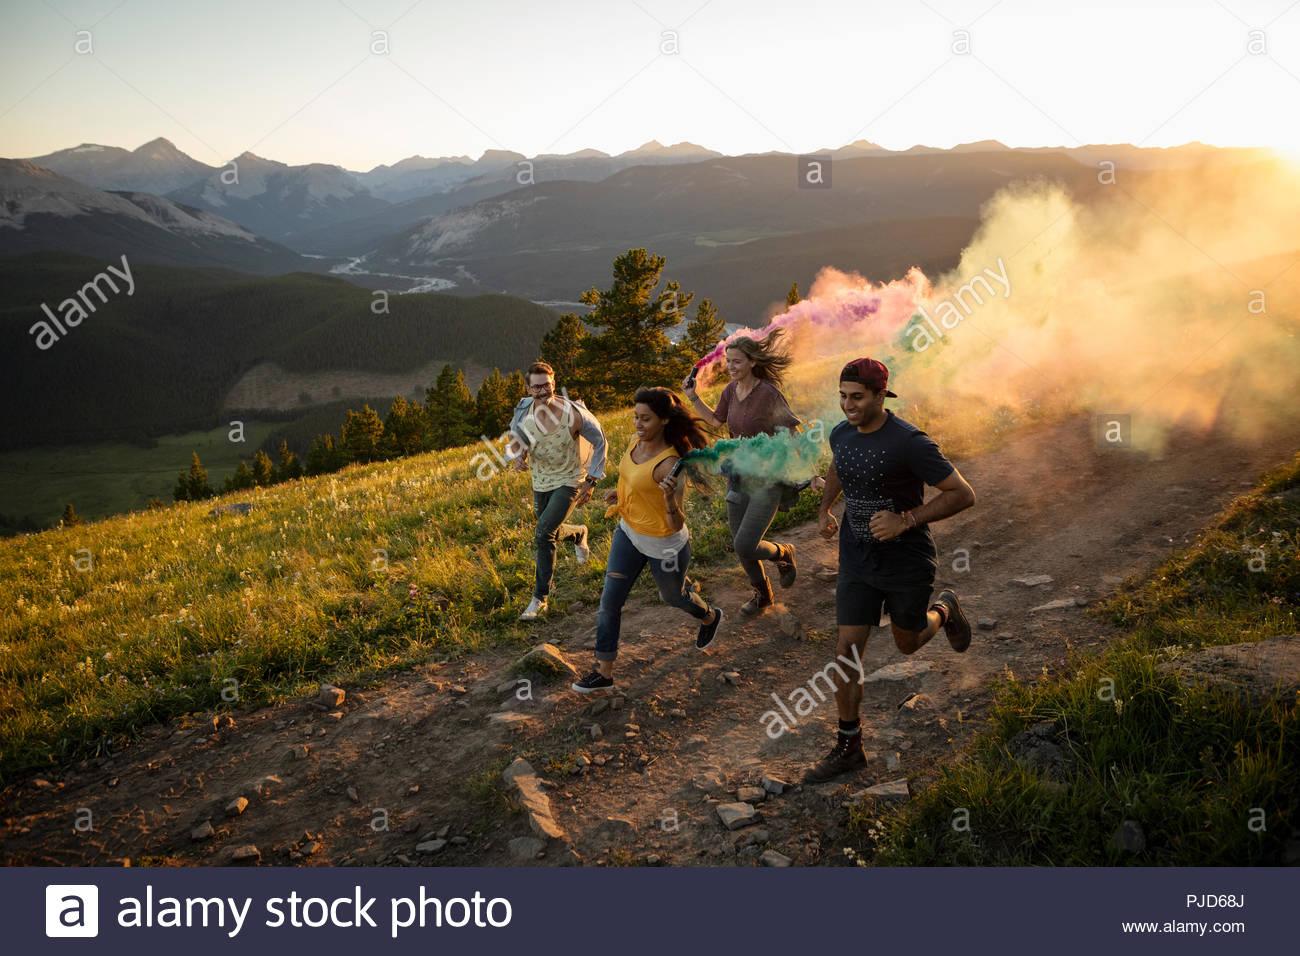 Playful friends enjoying colorful smoke bombs on sunny mountain road, Alberta, Canada - Stock Image